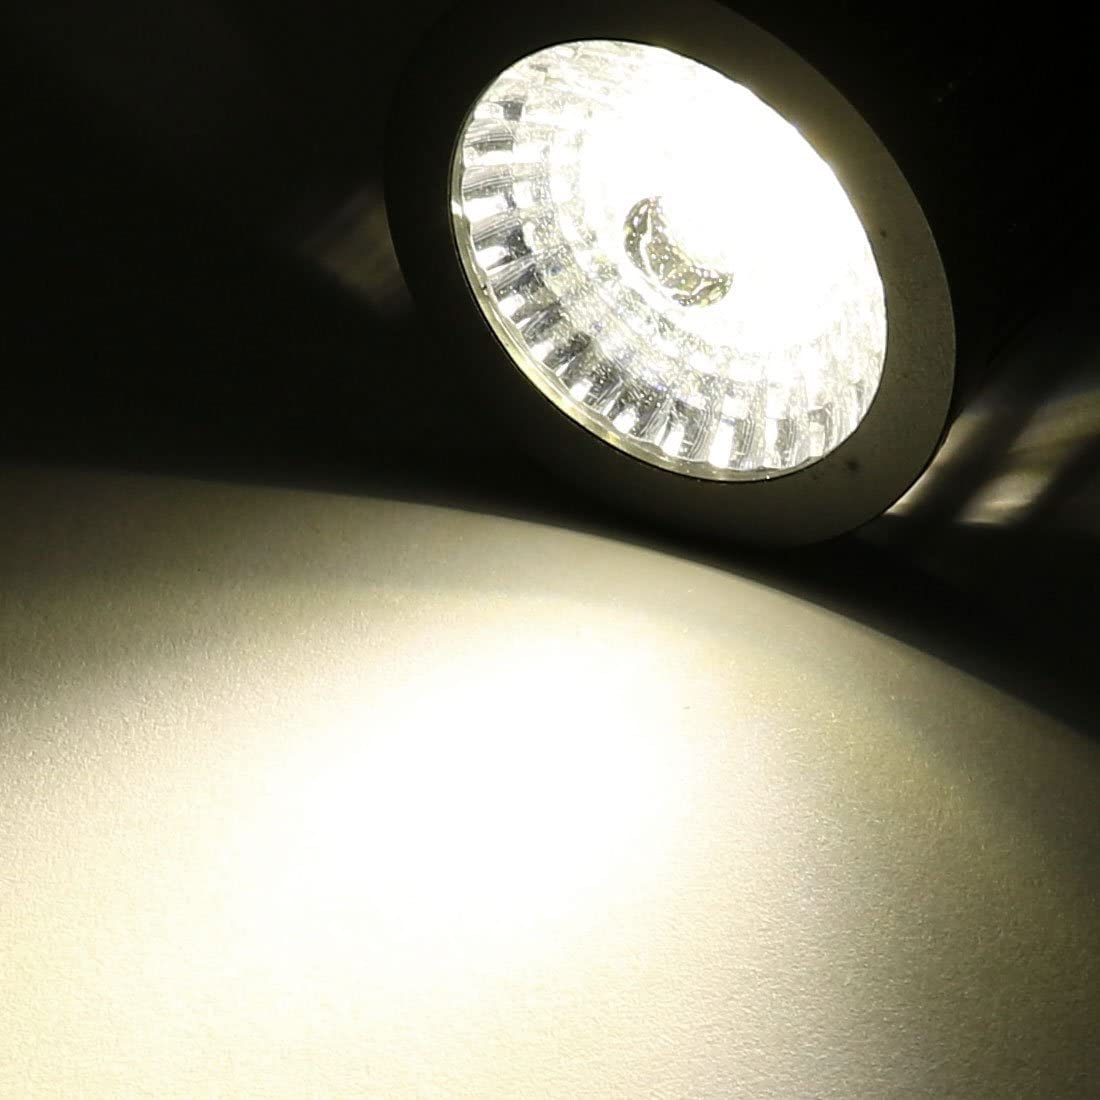 10W 30 Degree Beam Angle 60cm Arm Neutral Color LED Clip Desk Lamp Black